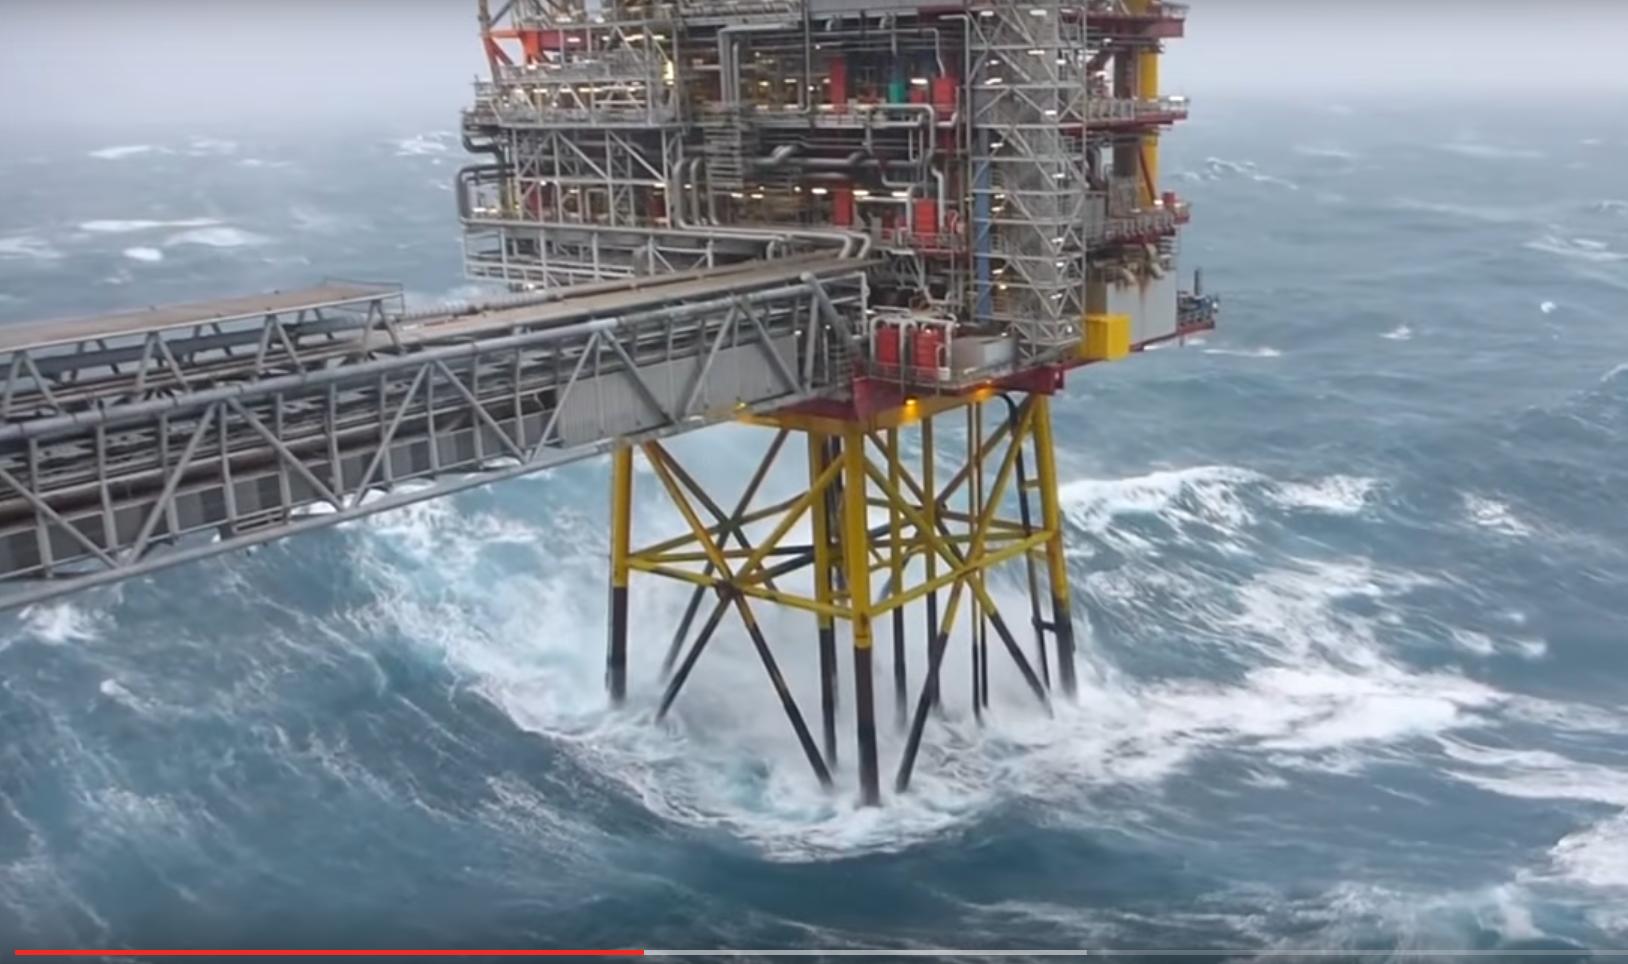 Workers have captured huge storm waves offshore